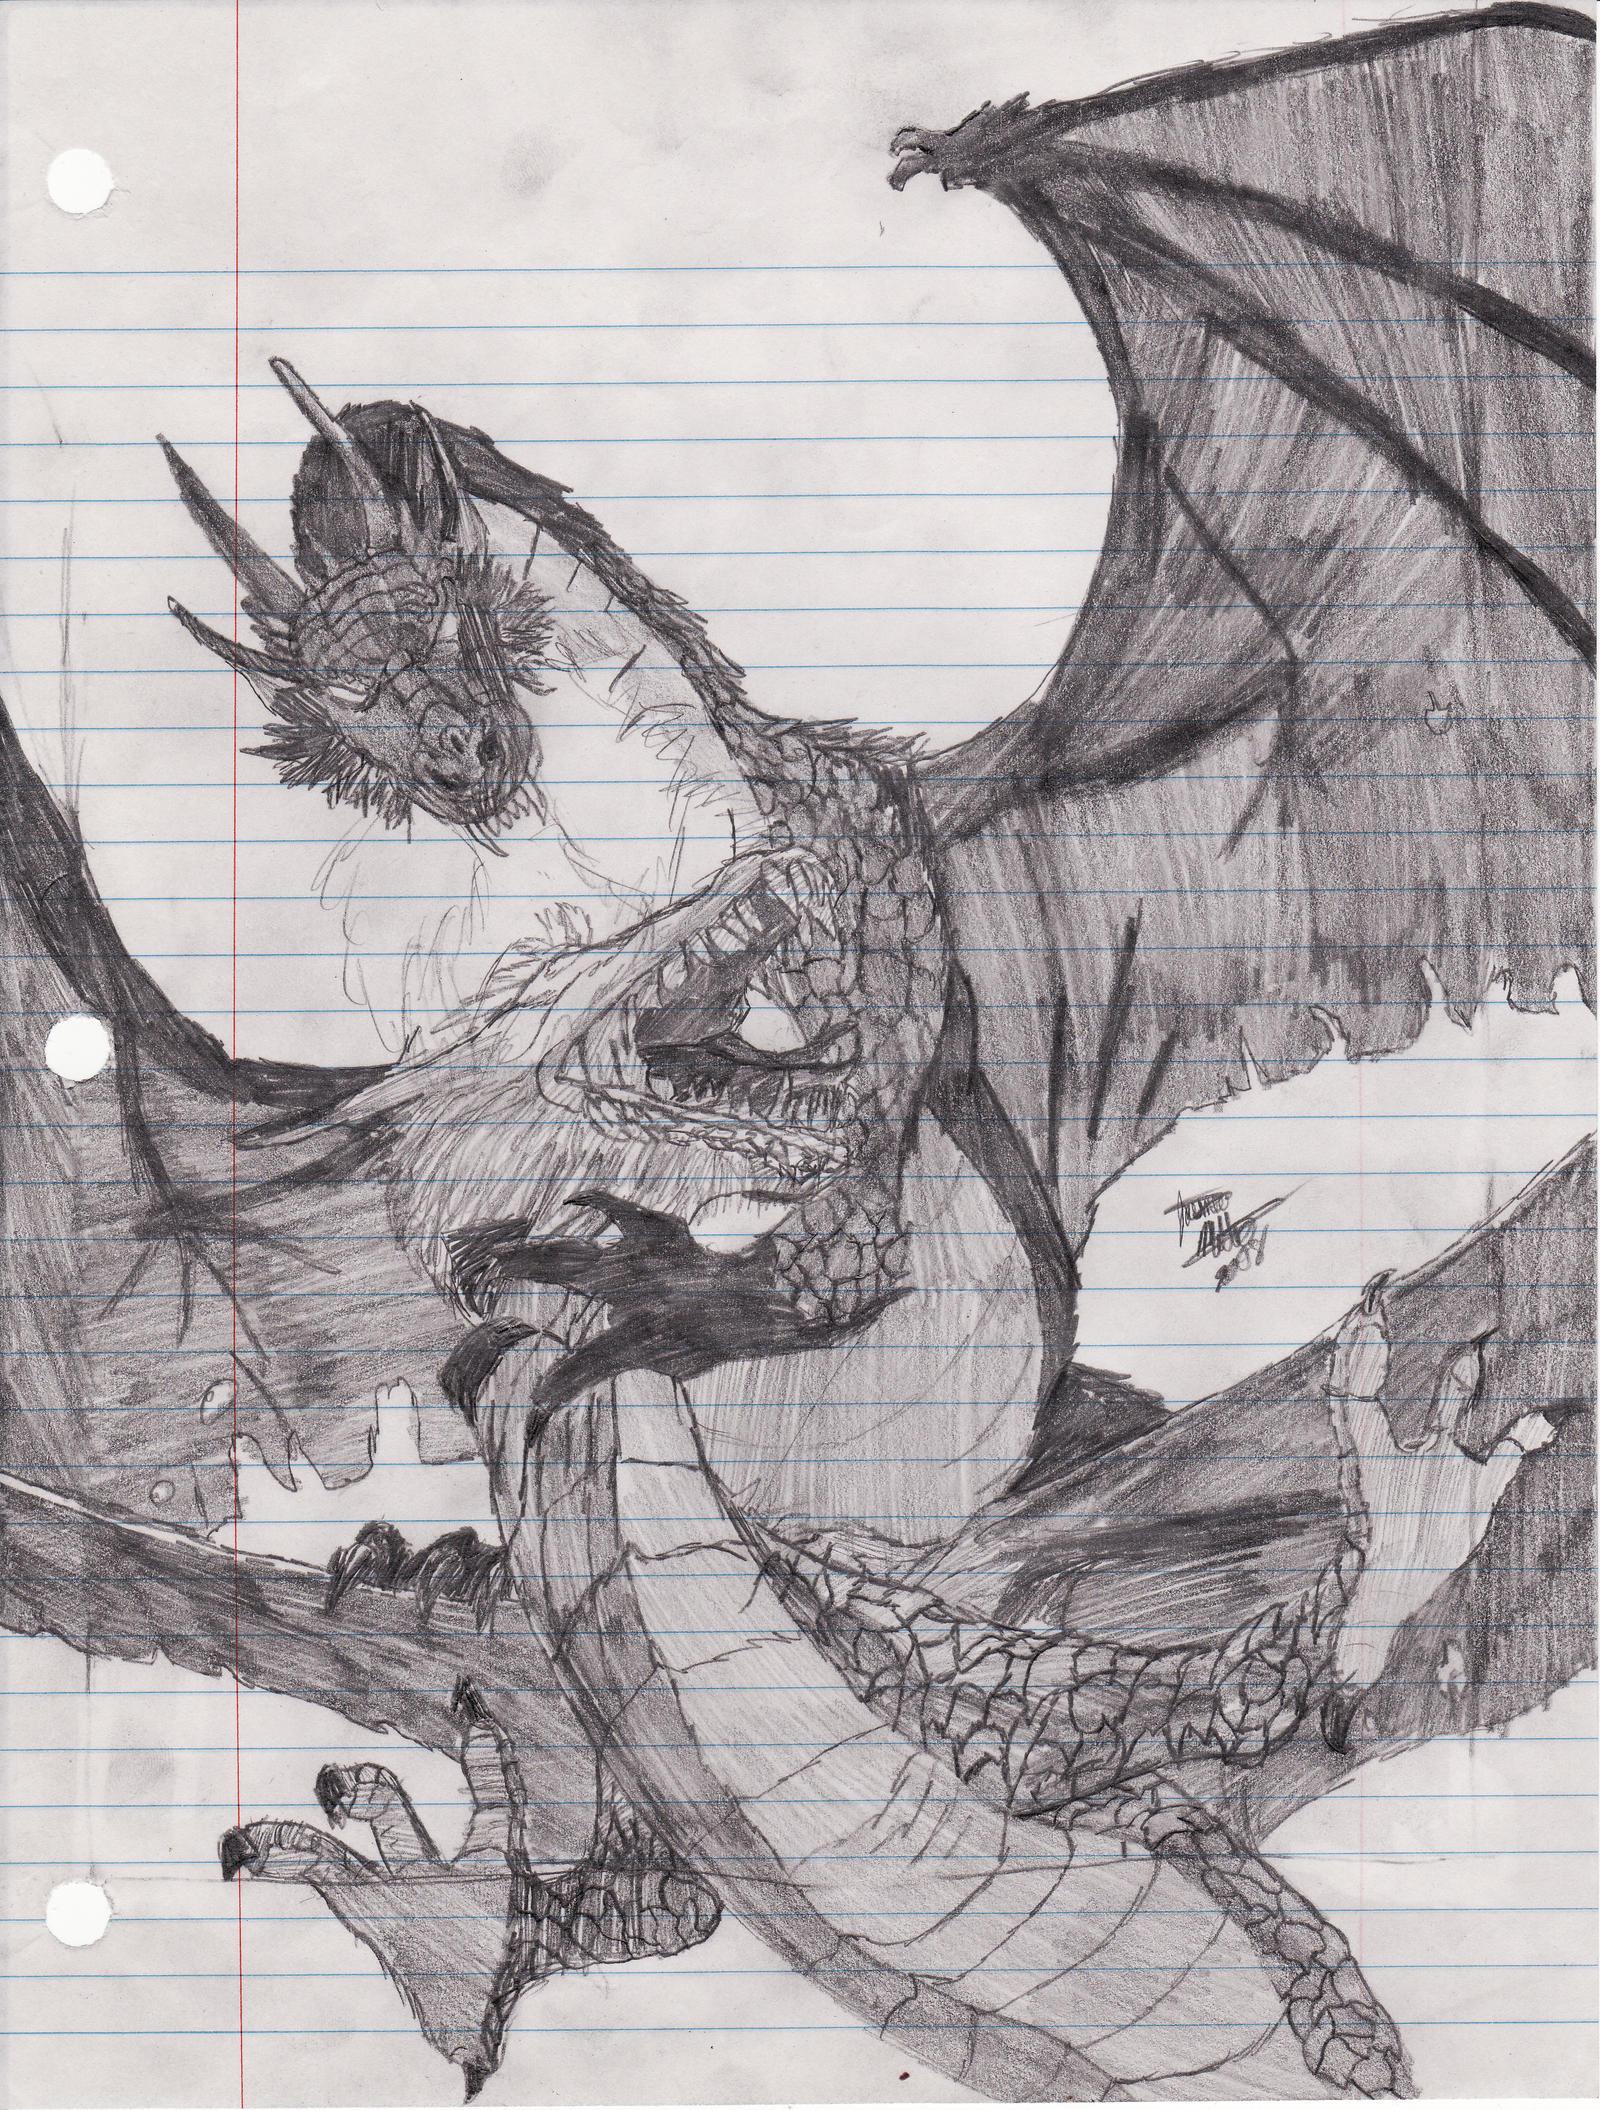 dragons fighting by okami lover1234 on deviantart